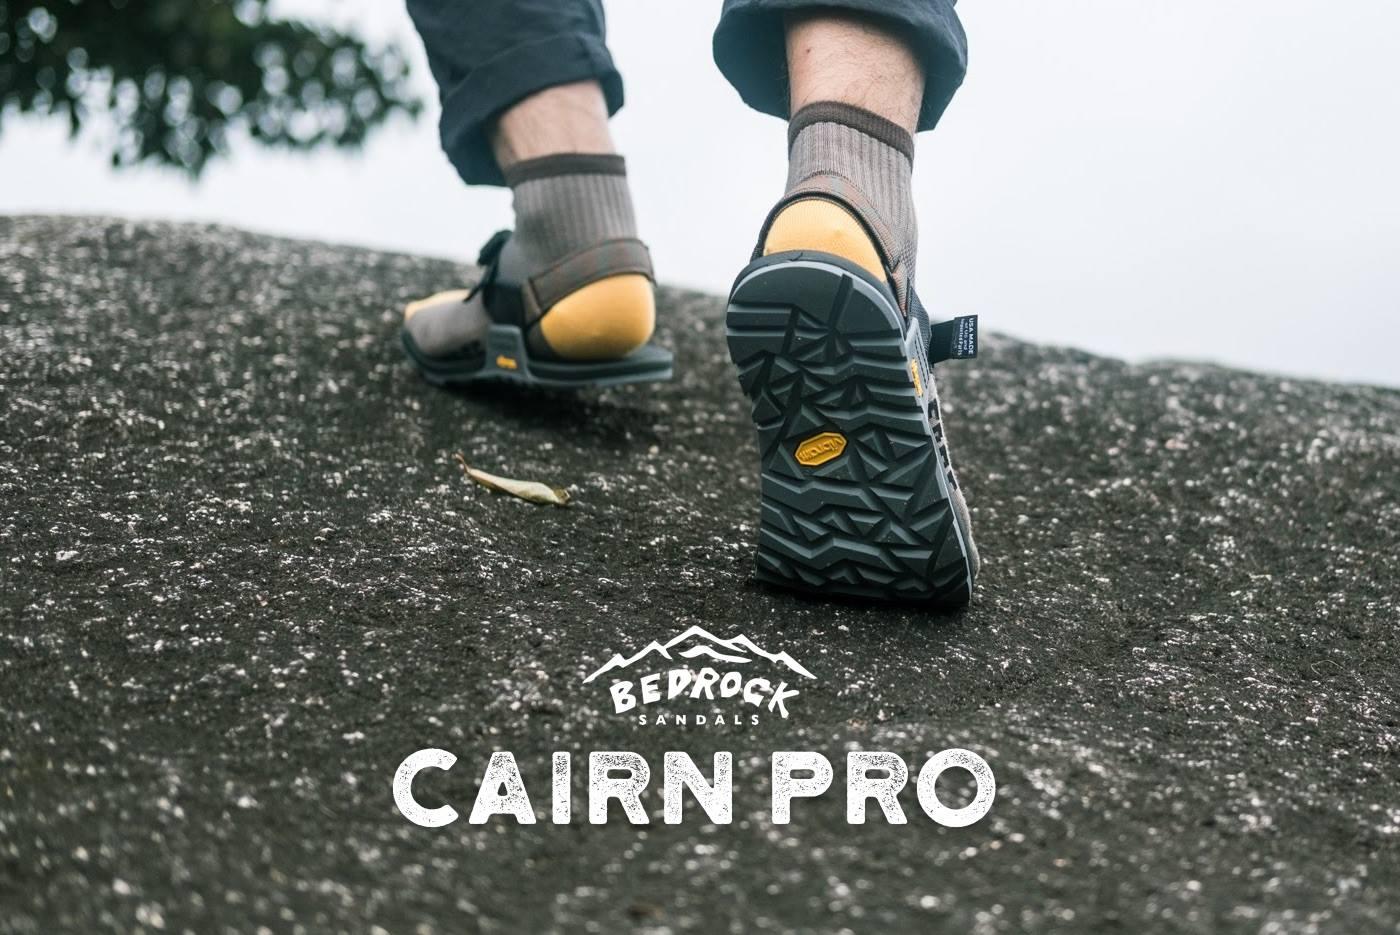 BEDROCK Cairn Pro